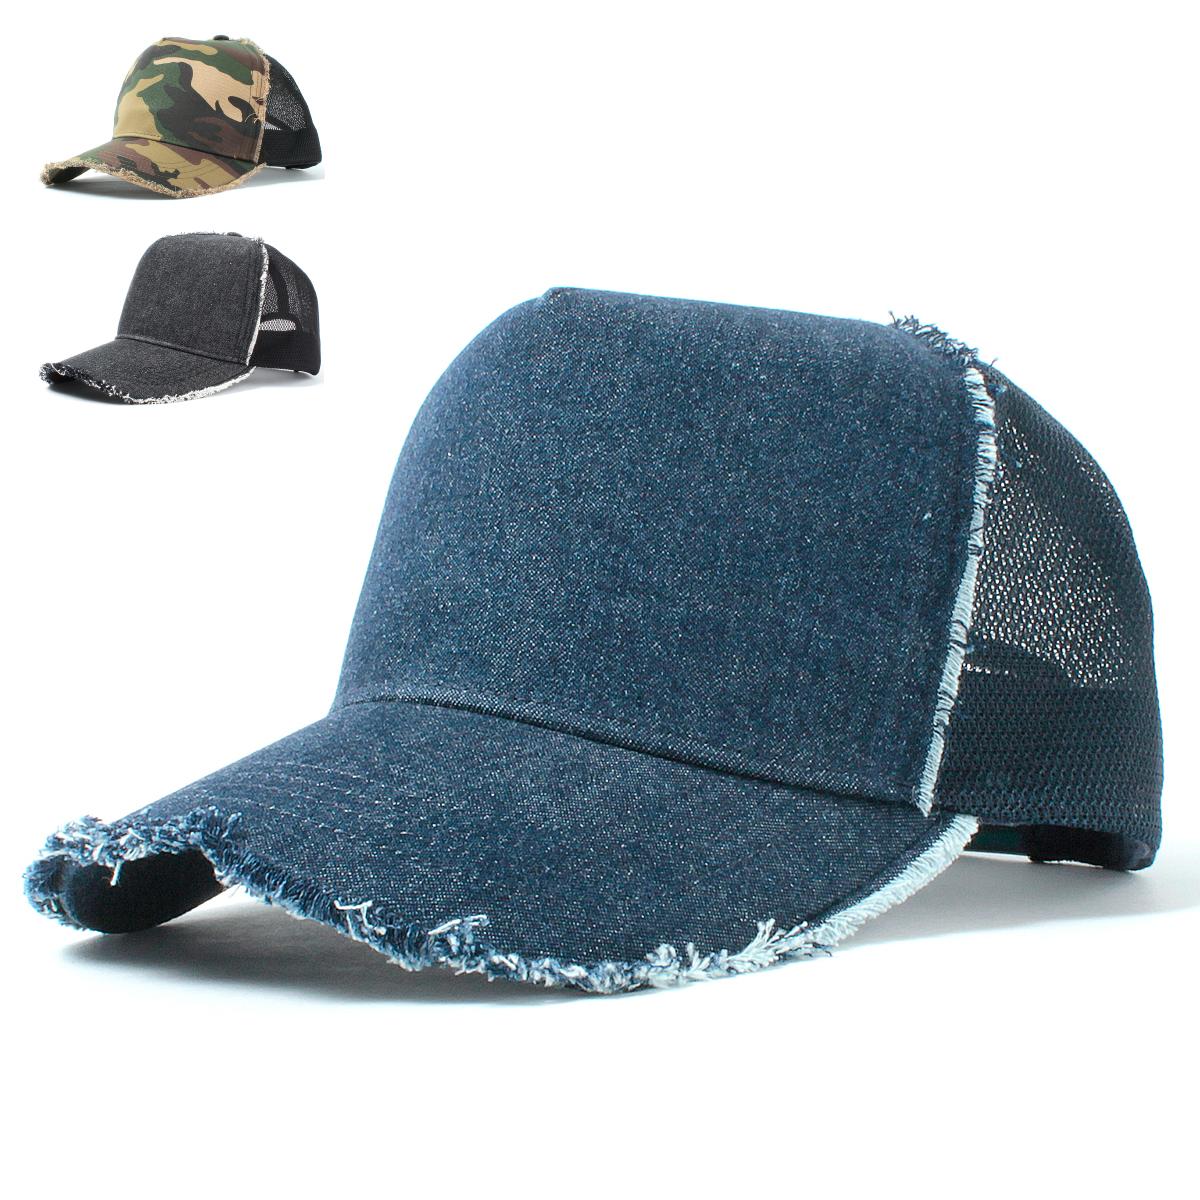 81a1e39981a31a Hats and Caps River-Up: Cap hat, mesh CAP, unisex-unisex, camouflage ...